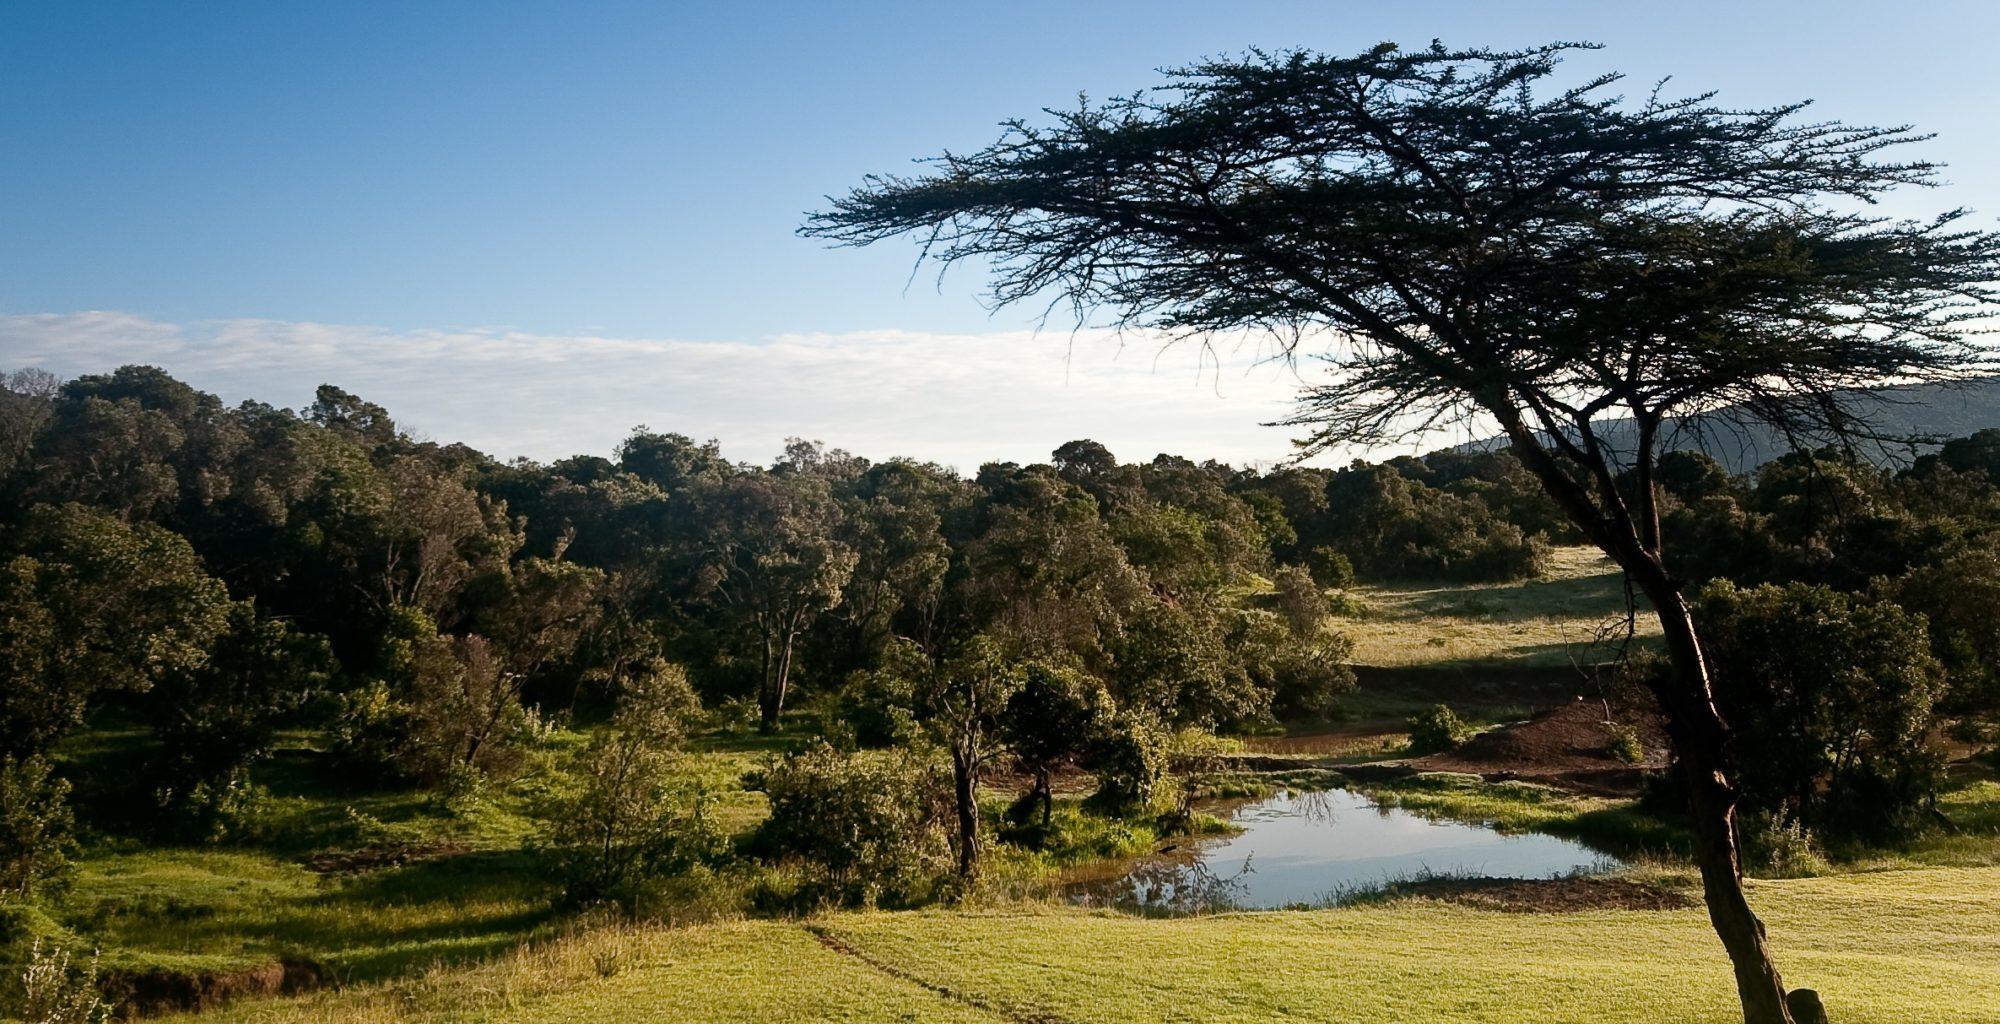 Kenya-Mara-House-Landscape-Views